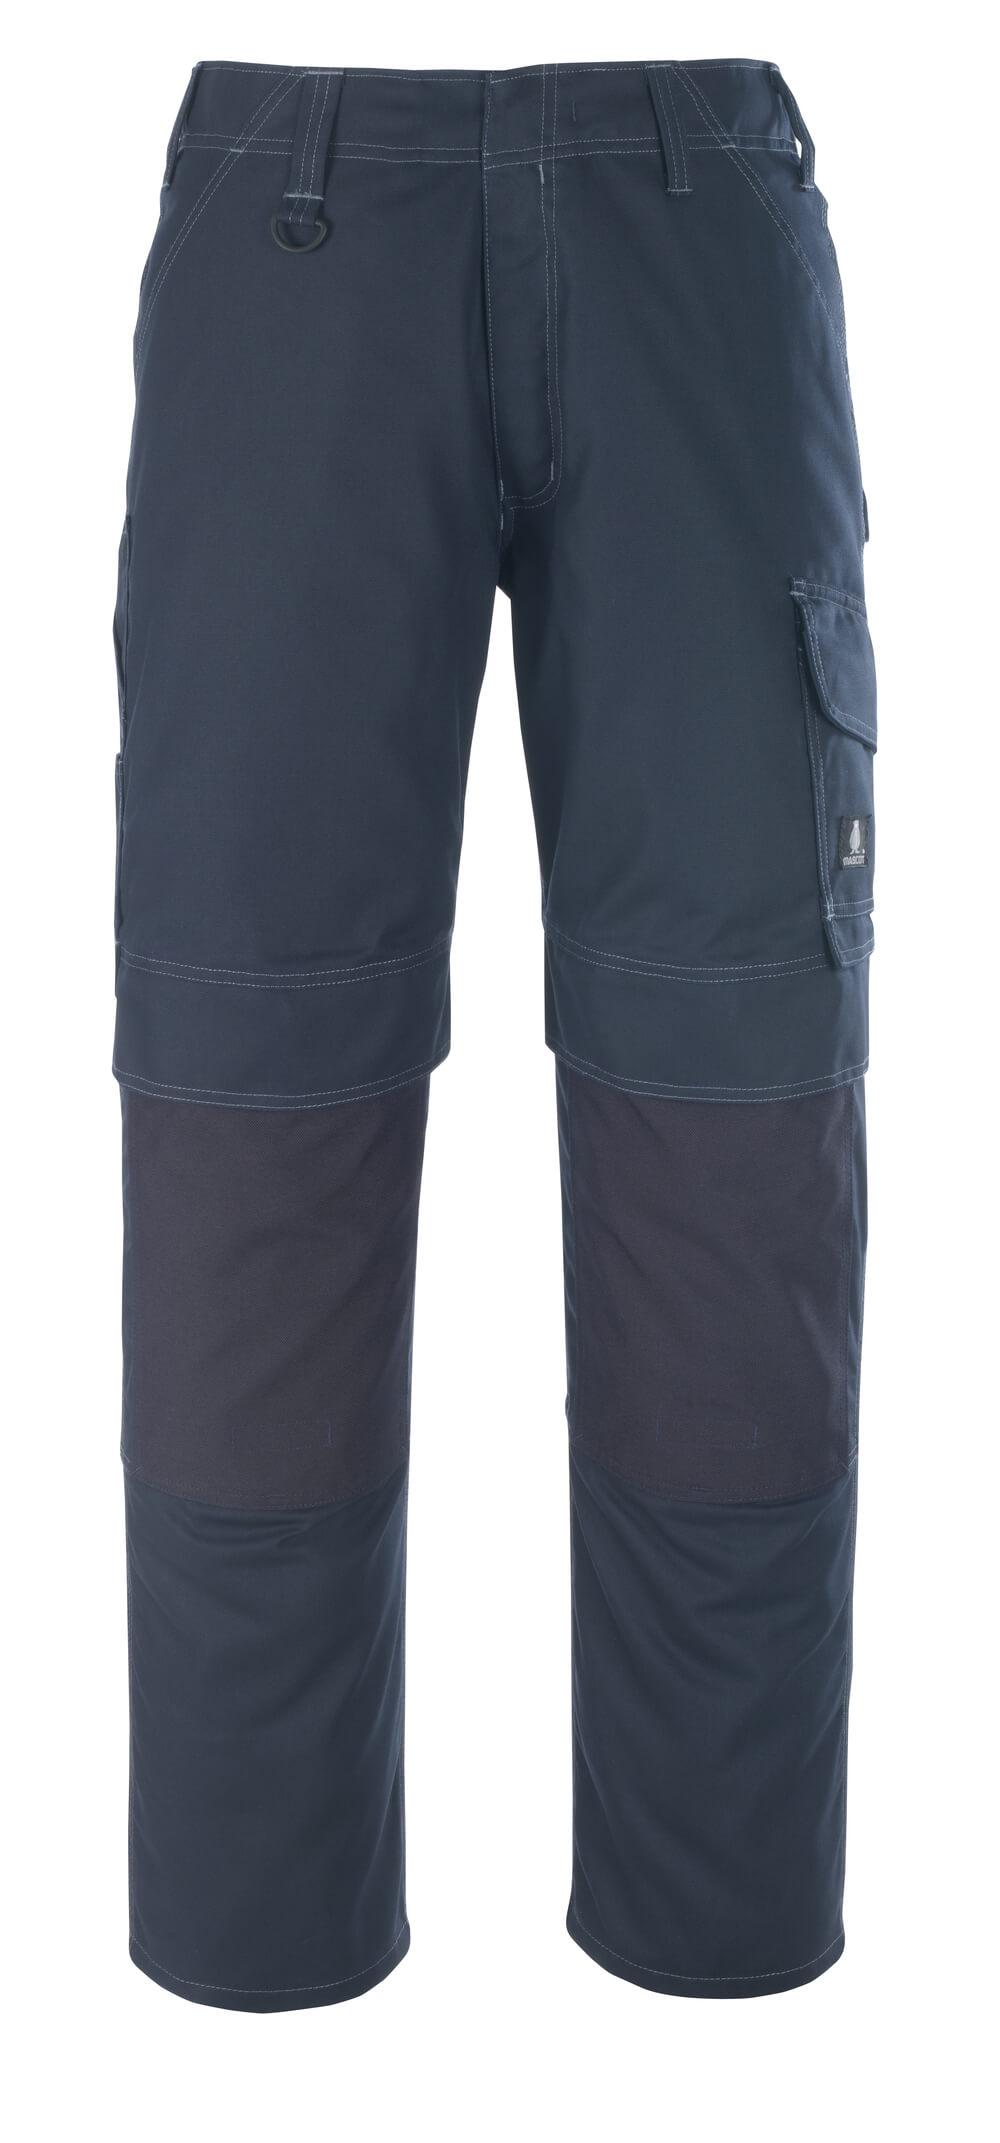 10179-154-010 Pants with kneepad pockets - dark navy